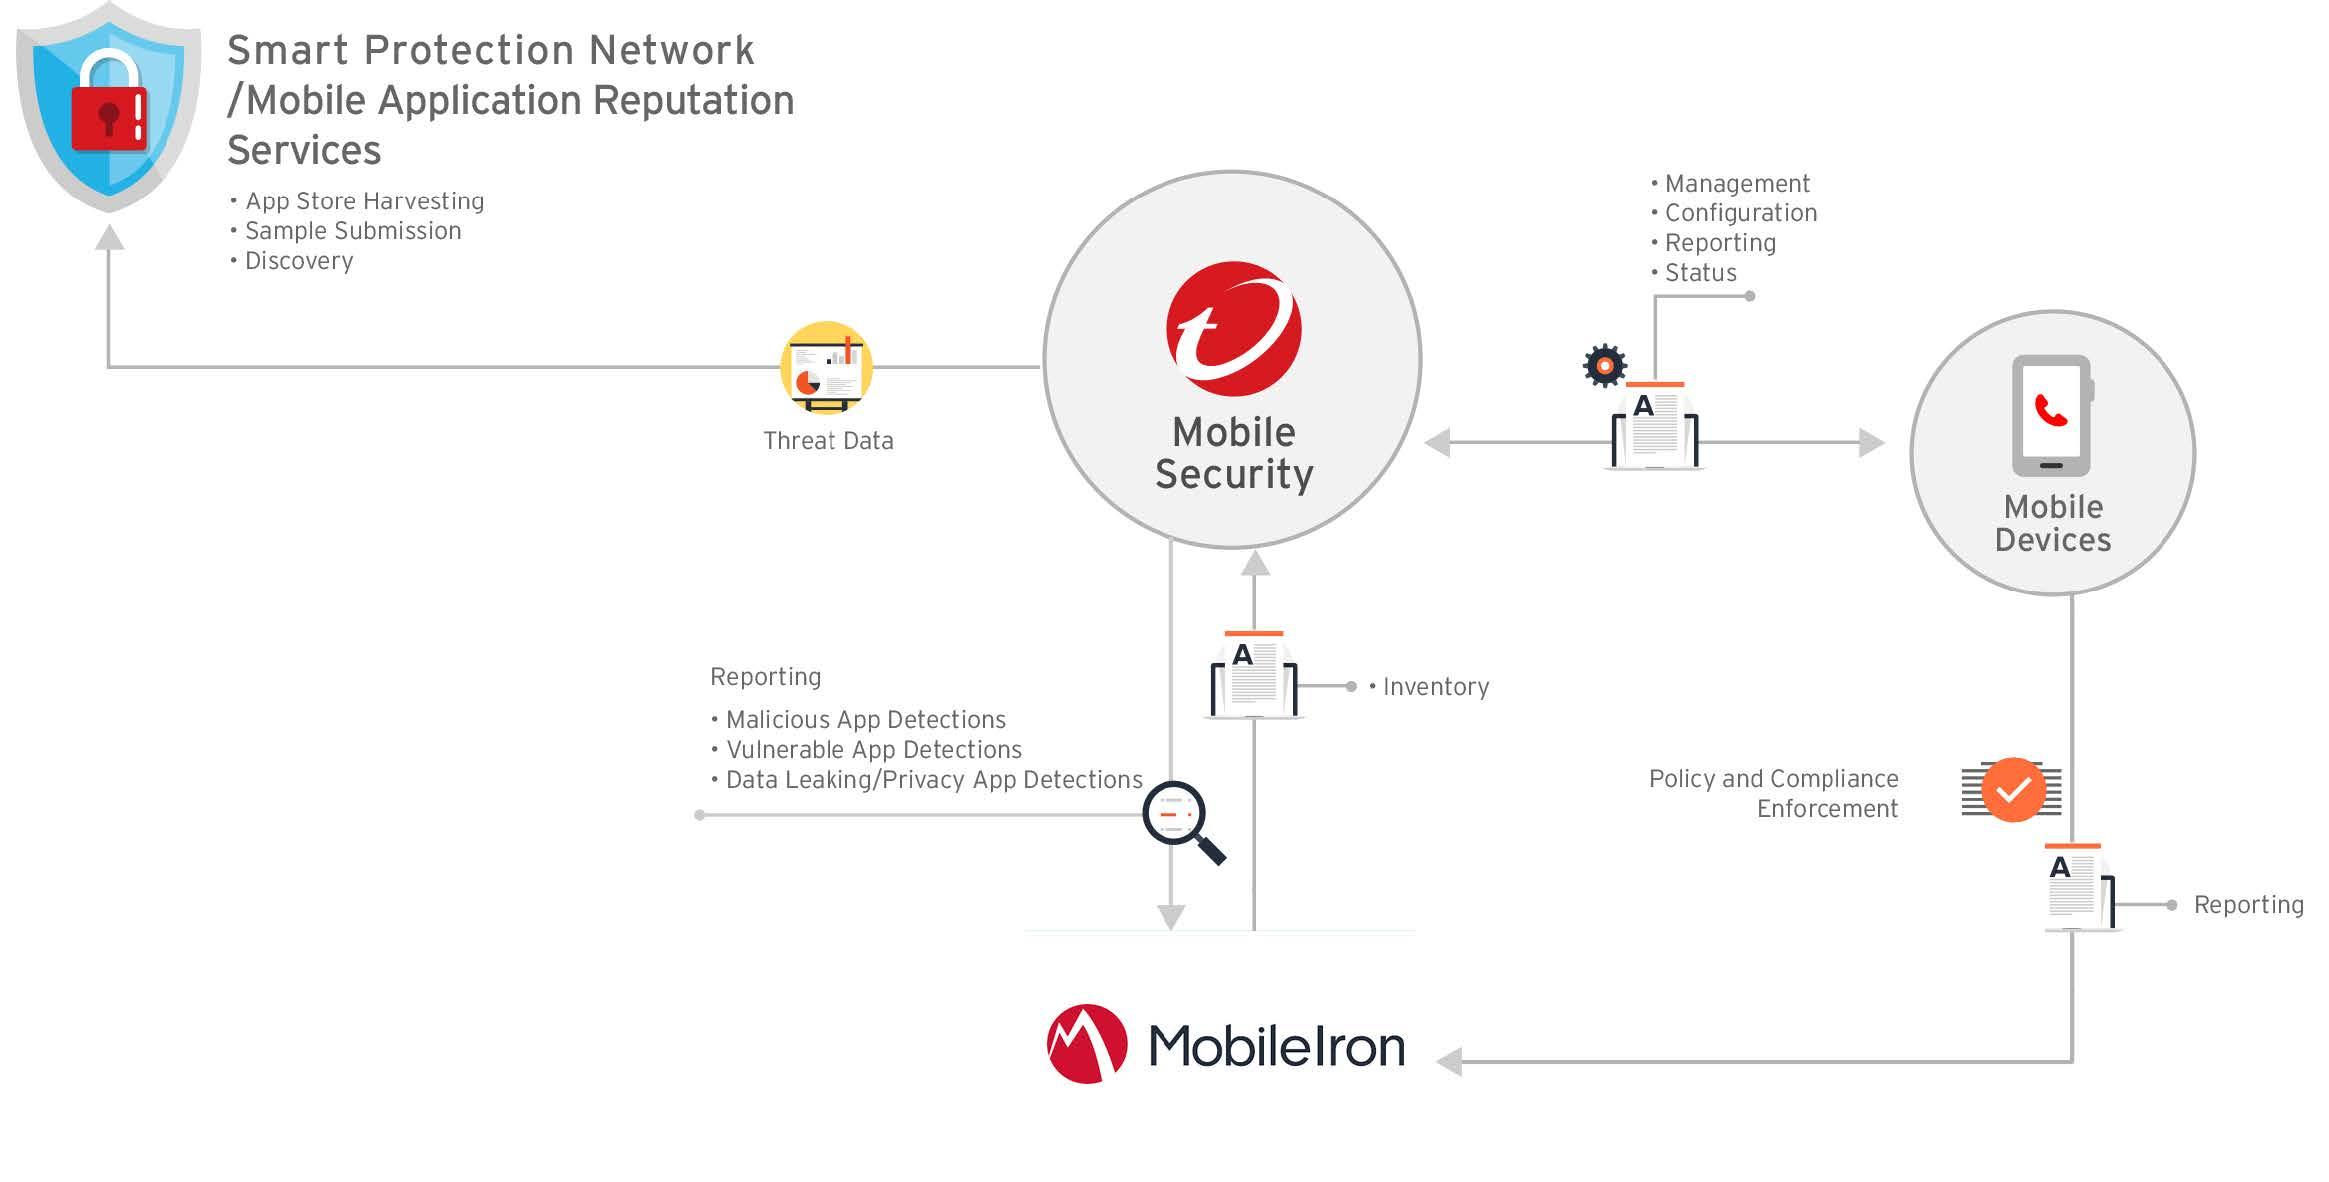 Mobileiron Integration Architecture